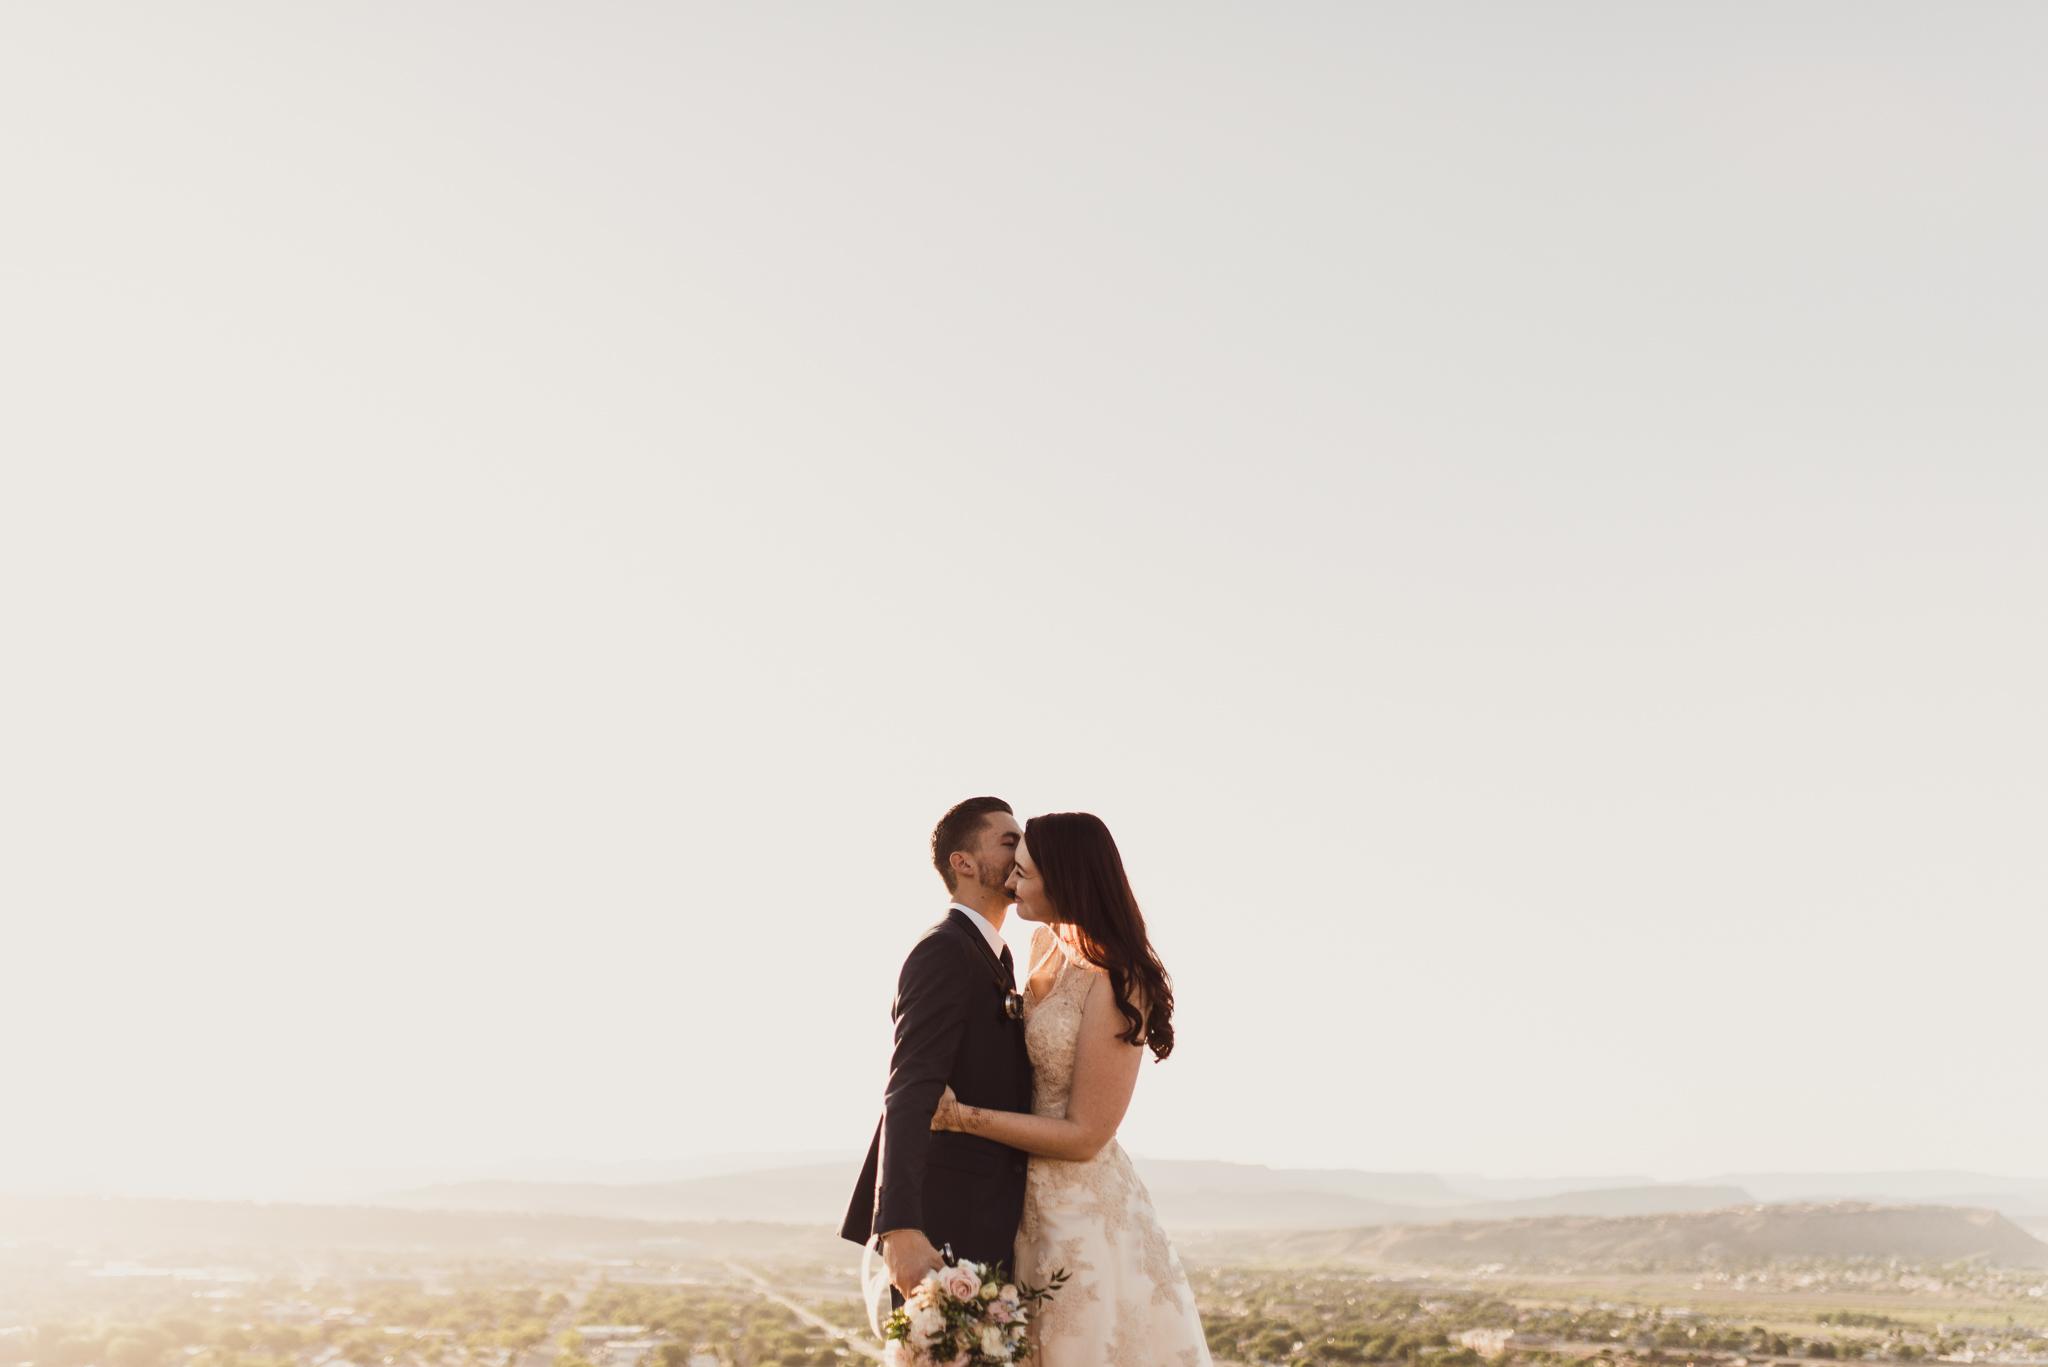 ©Isaiah & Taylor Photography - Kyle & Tori-12.jpg